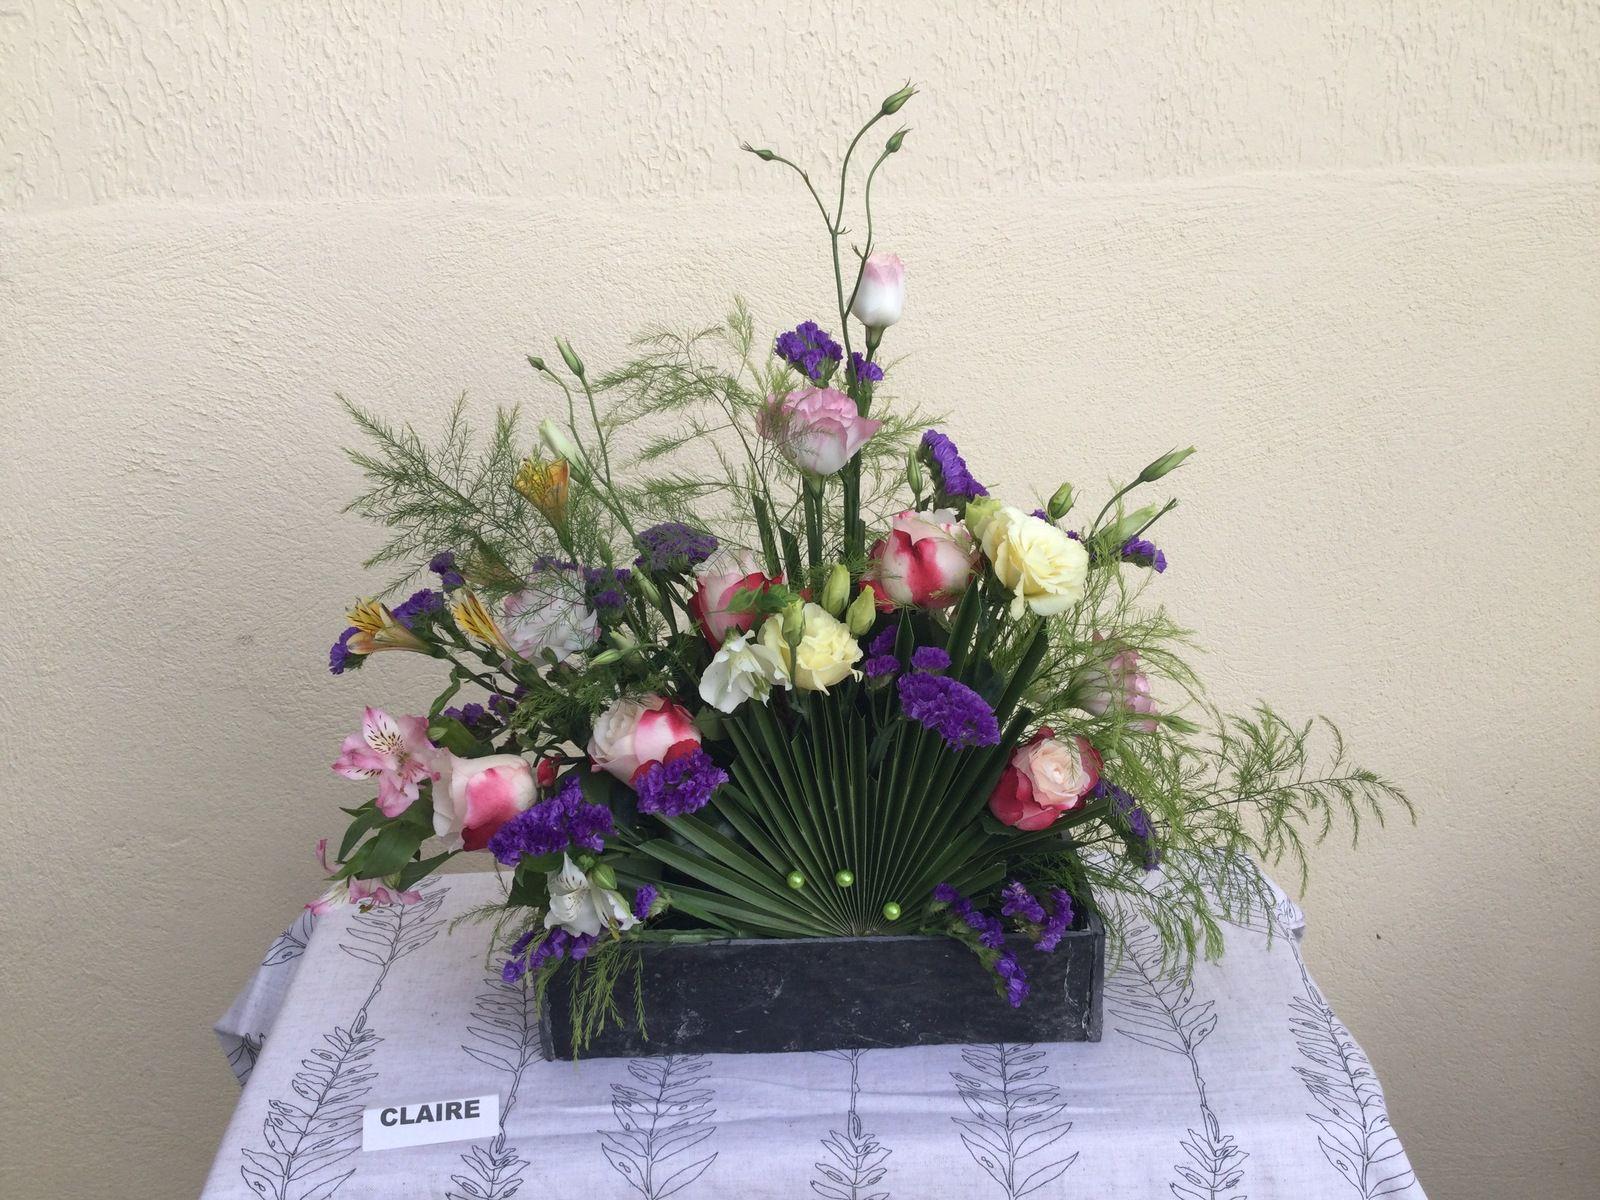 Chamerops, Lysanthus, Alstroméria, Treefen, Statice, Roses